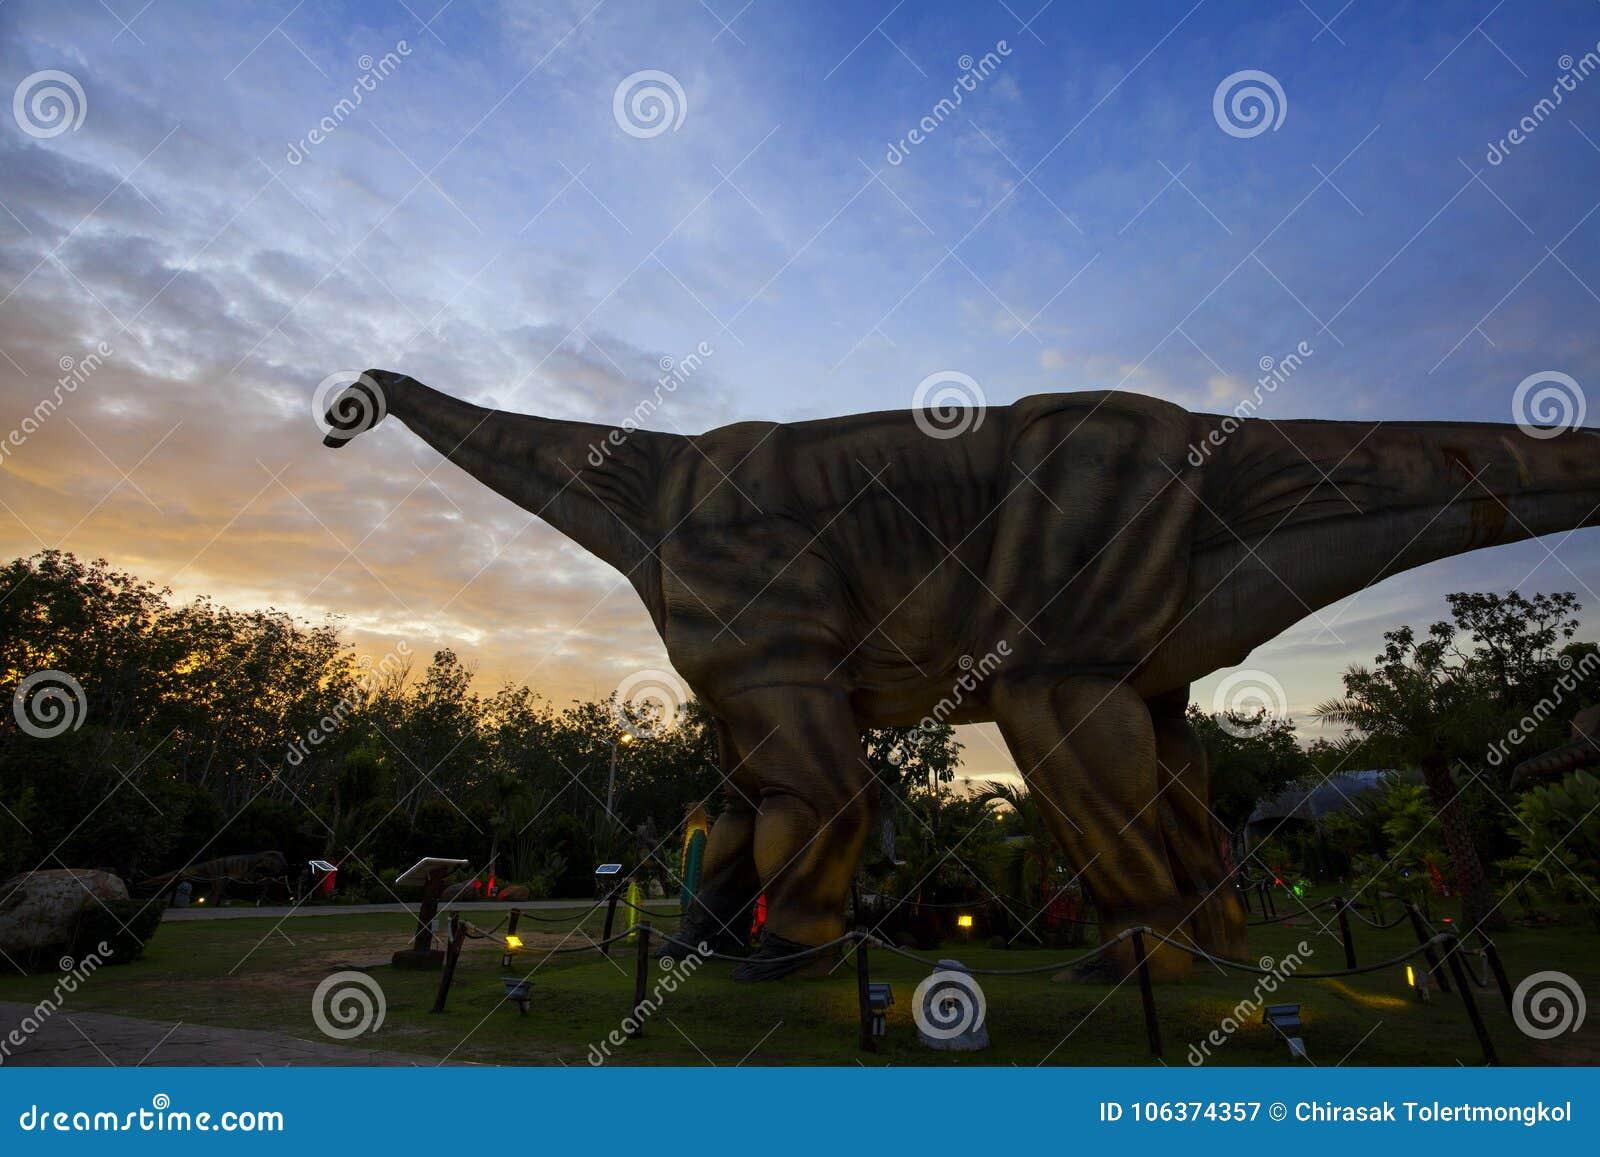 Dinosaur Park in Thailand stock image  Image of dinosaur - 106374357